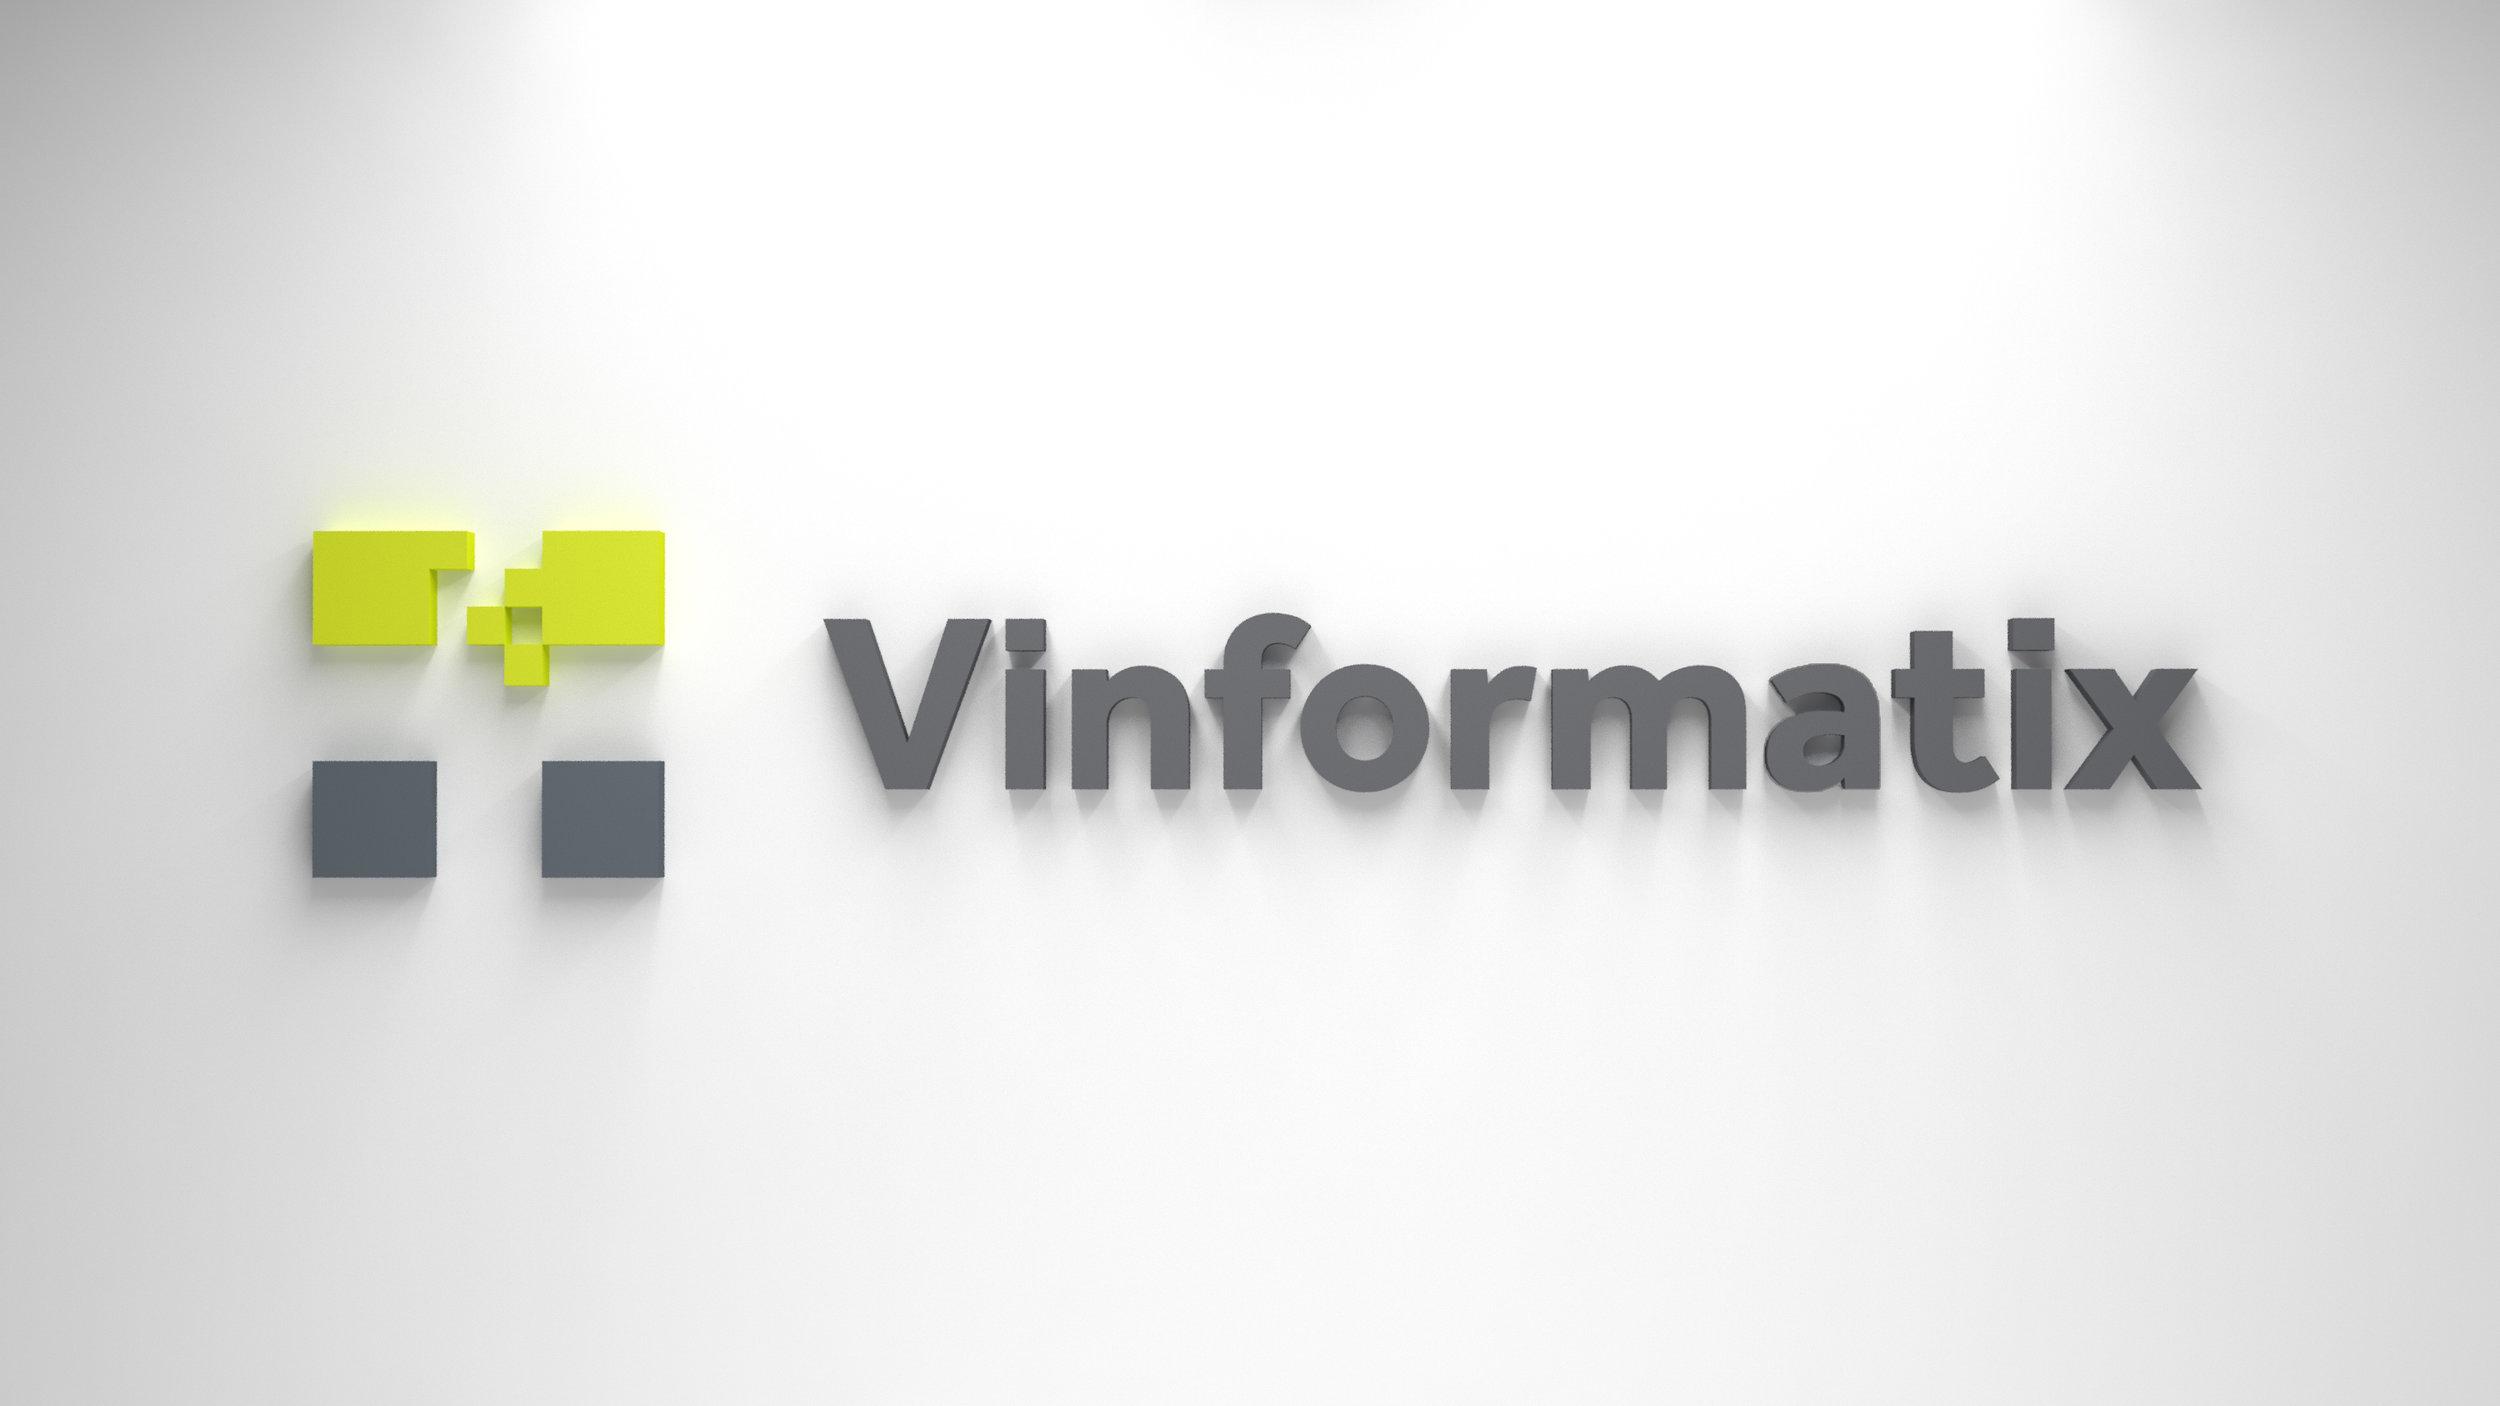 Vinformatix_c4d_V8.jpg